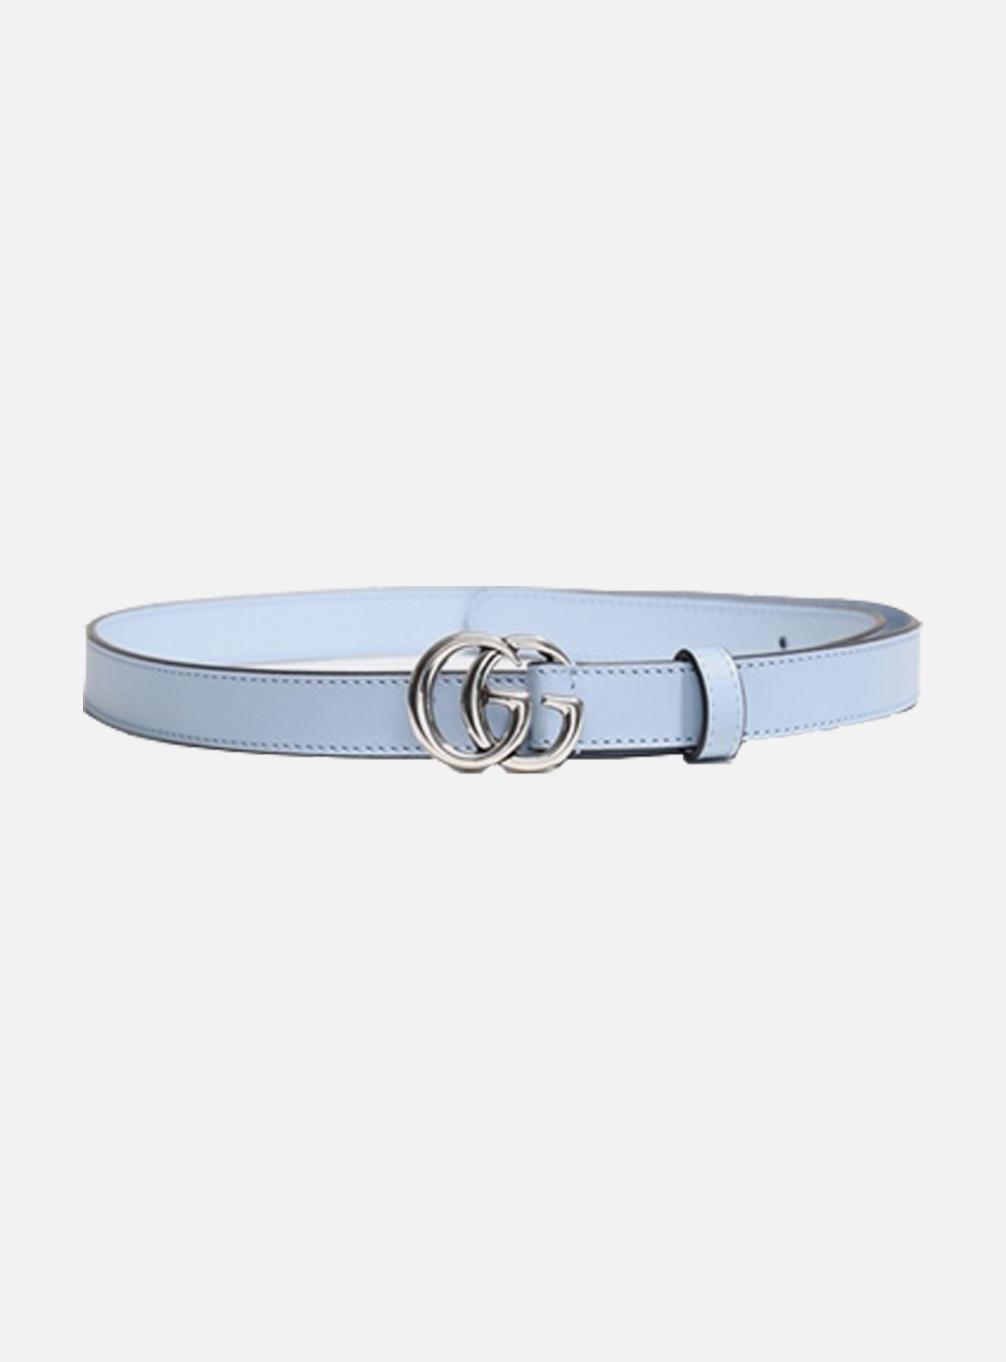 GG Marmont Dougle G Buckle Belt (409417 AP00P 4928)